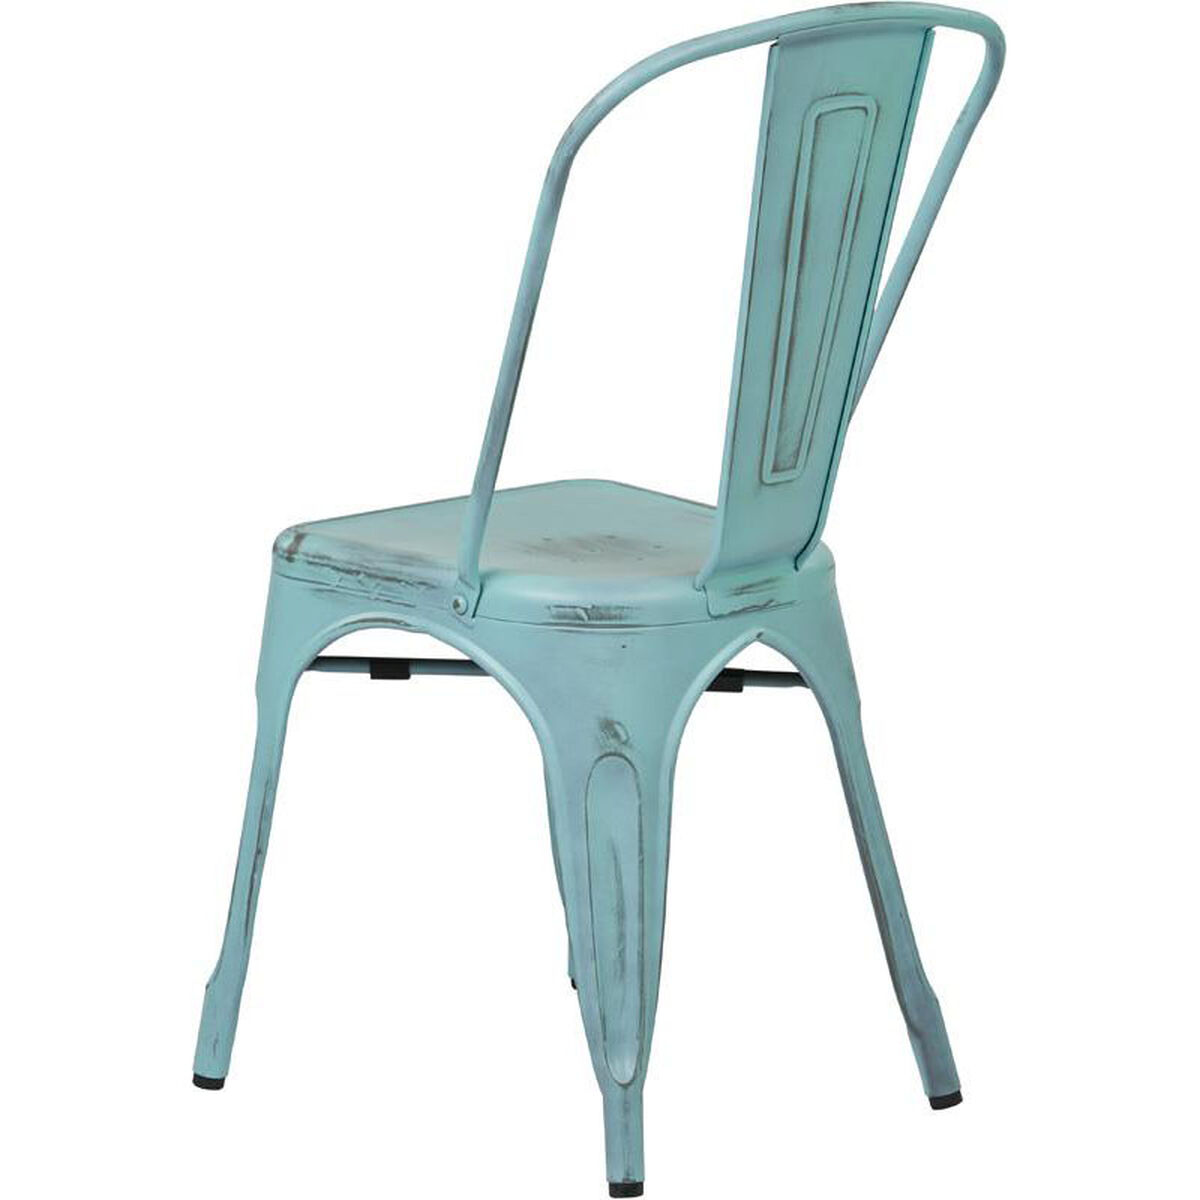 Set Of 4 Blue Stacking Chair Brw29a4 Asb Bizchair Com